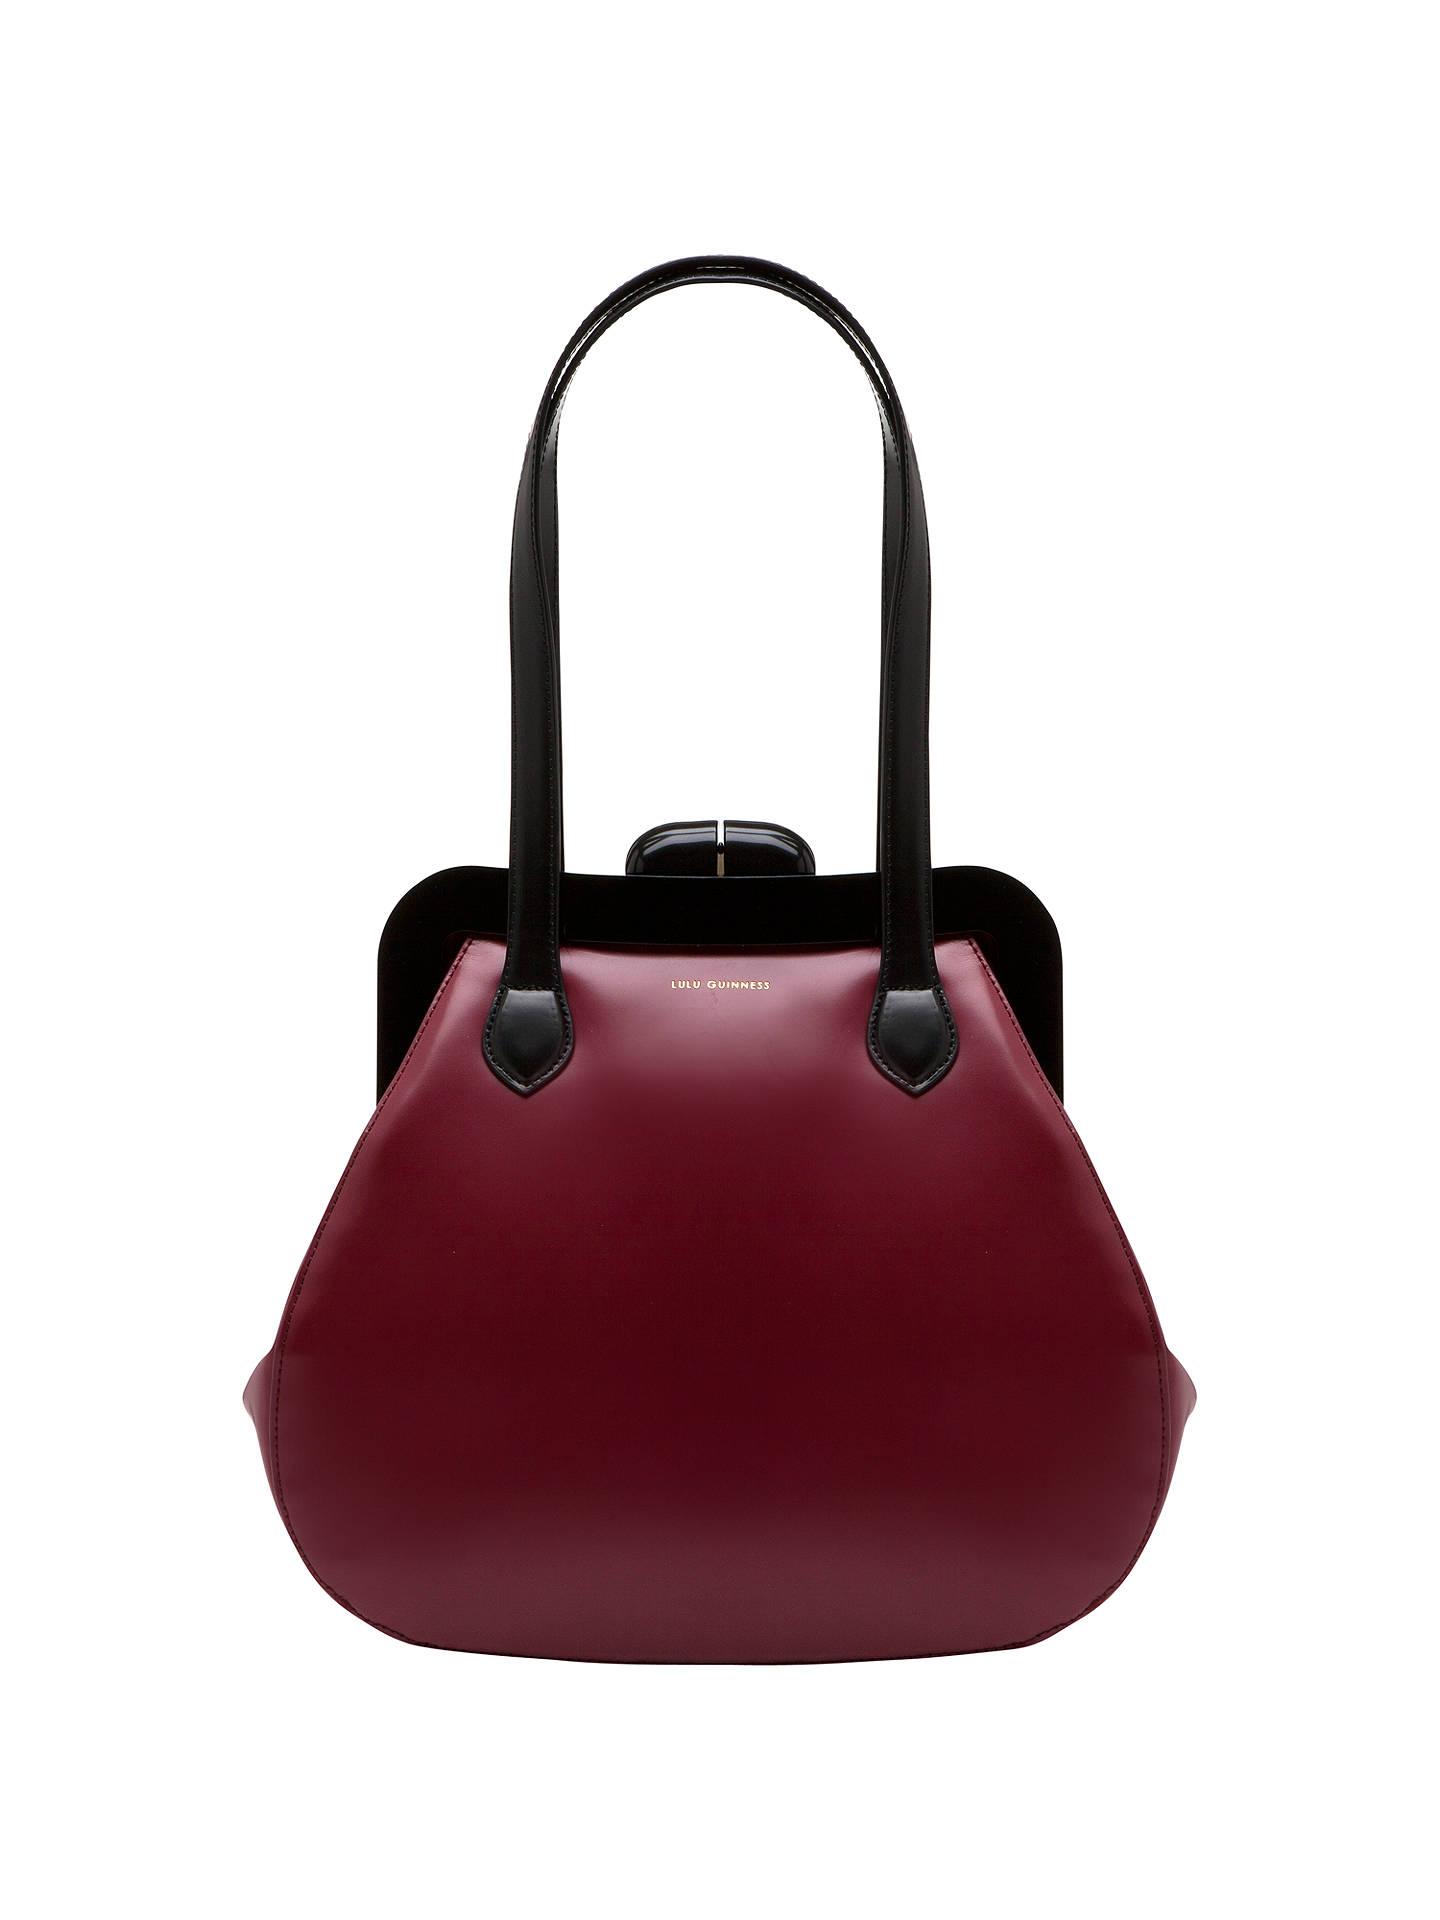 Lulu Guinness Mid Pollyanna Patent Leather Shoulder Handbag Burgundy